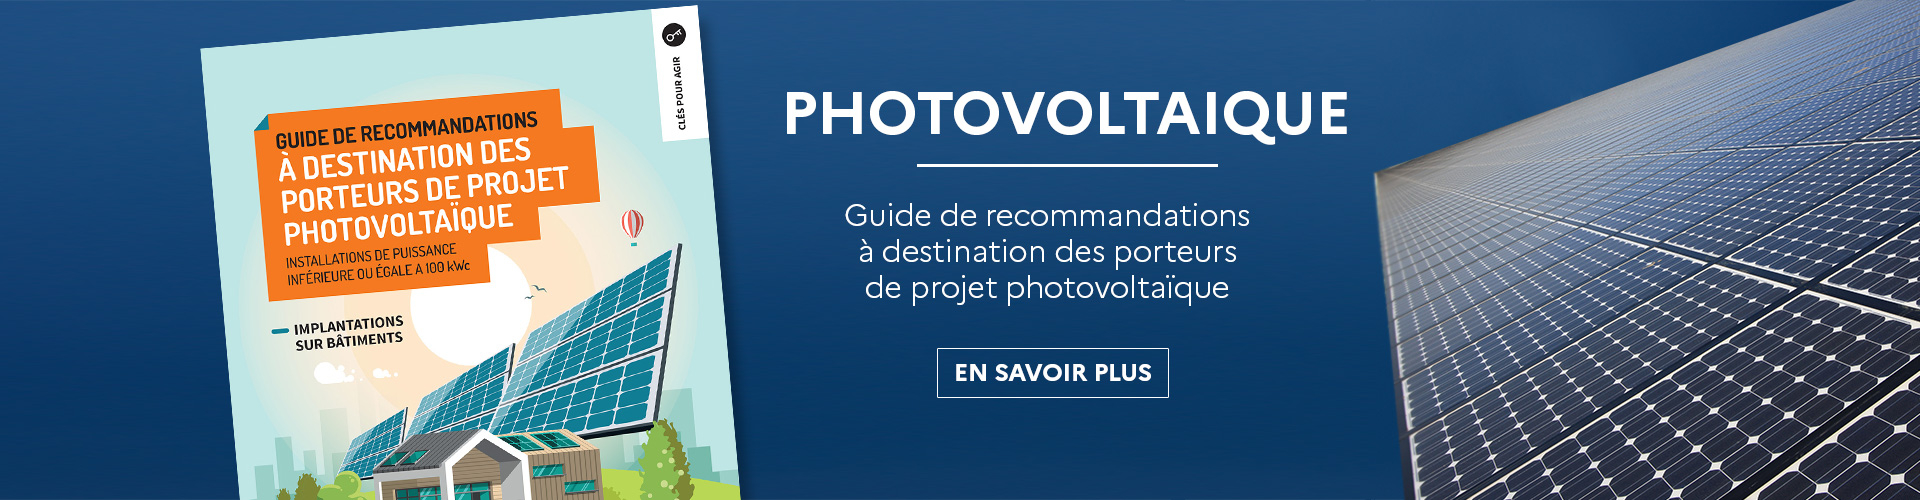 Recommandations-photovoltaïque